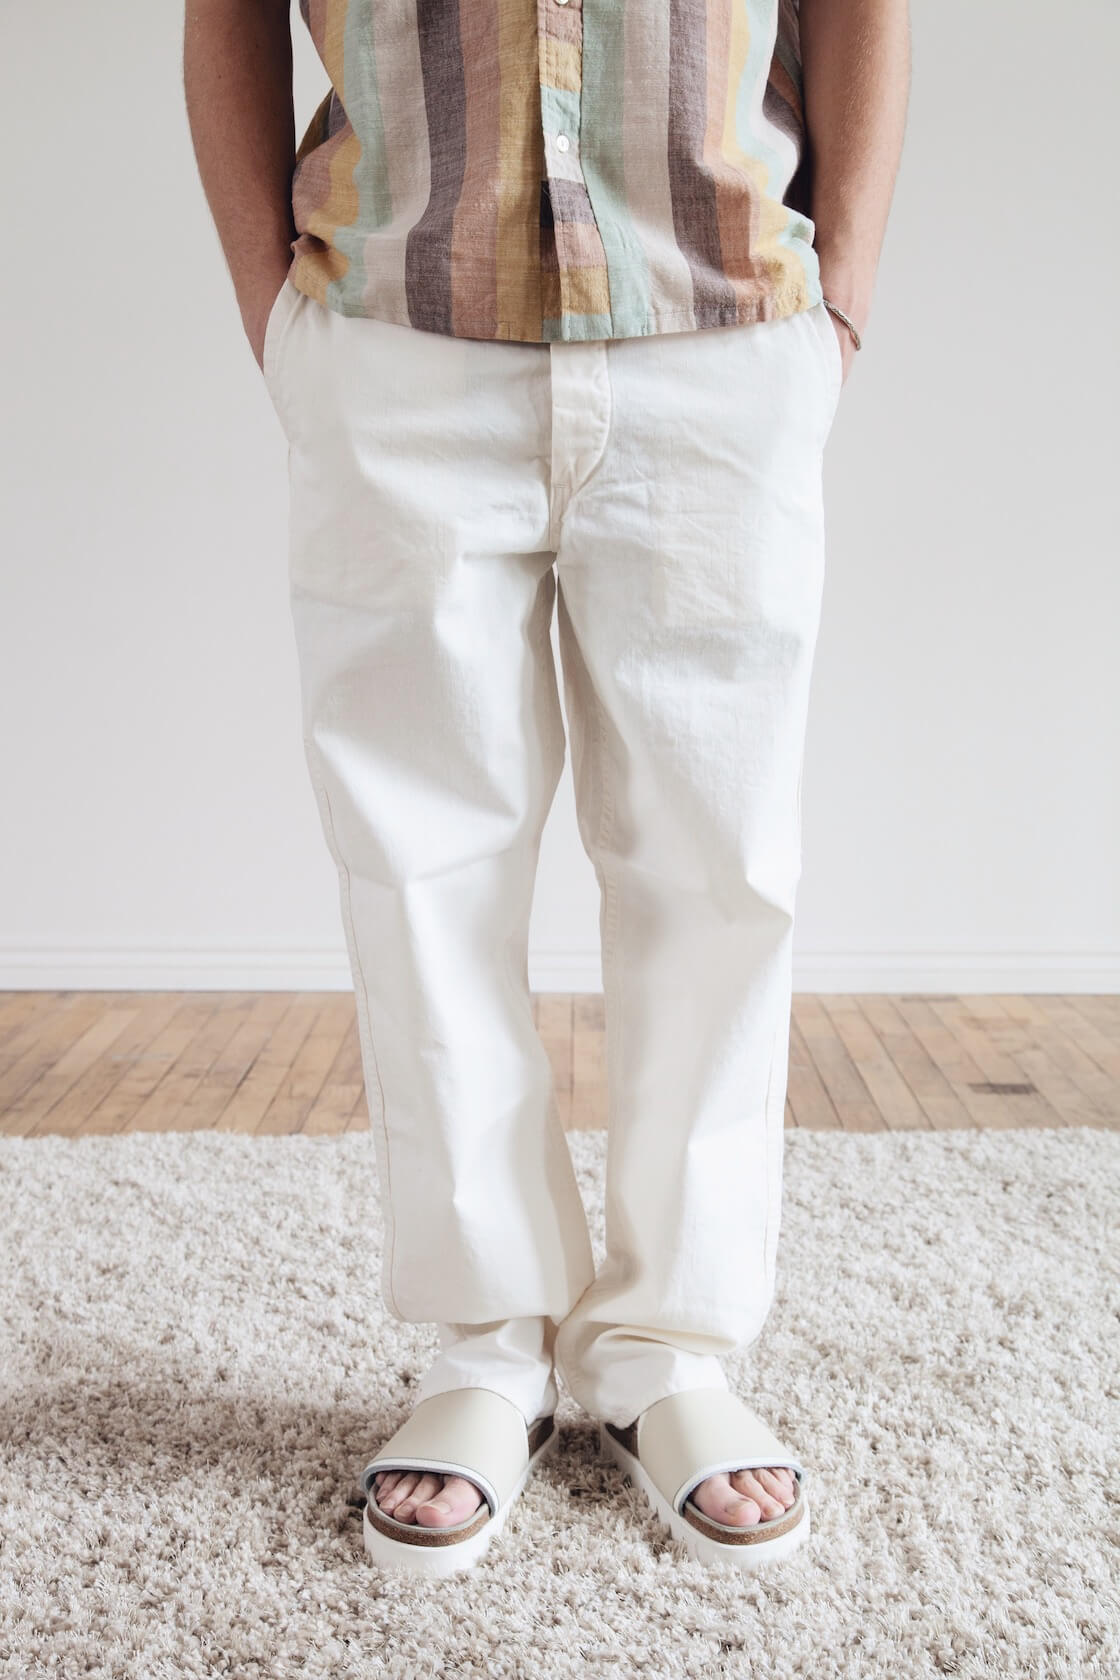 cableami canvas dixie hat, beams plus italian collar slab multi stripe shirt, corridor cotton seed drawstring pants and hender scheme caterpillar sandals on body